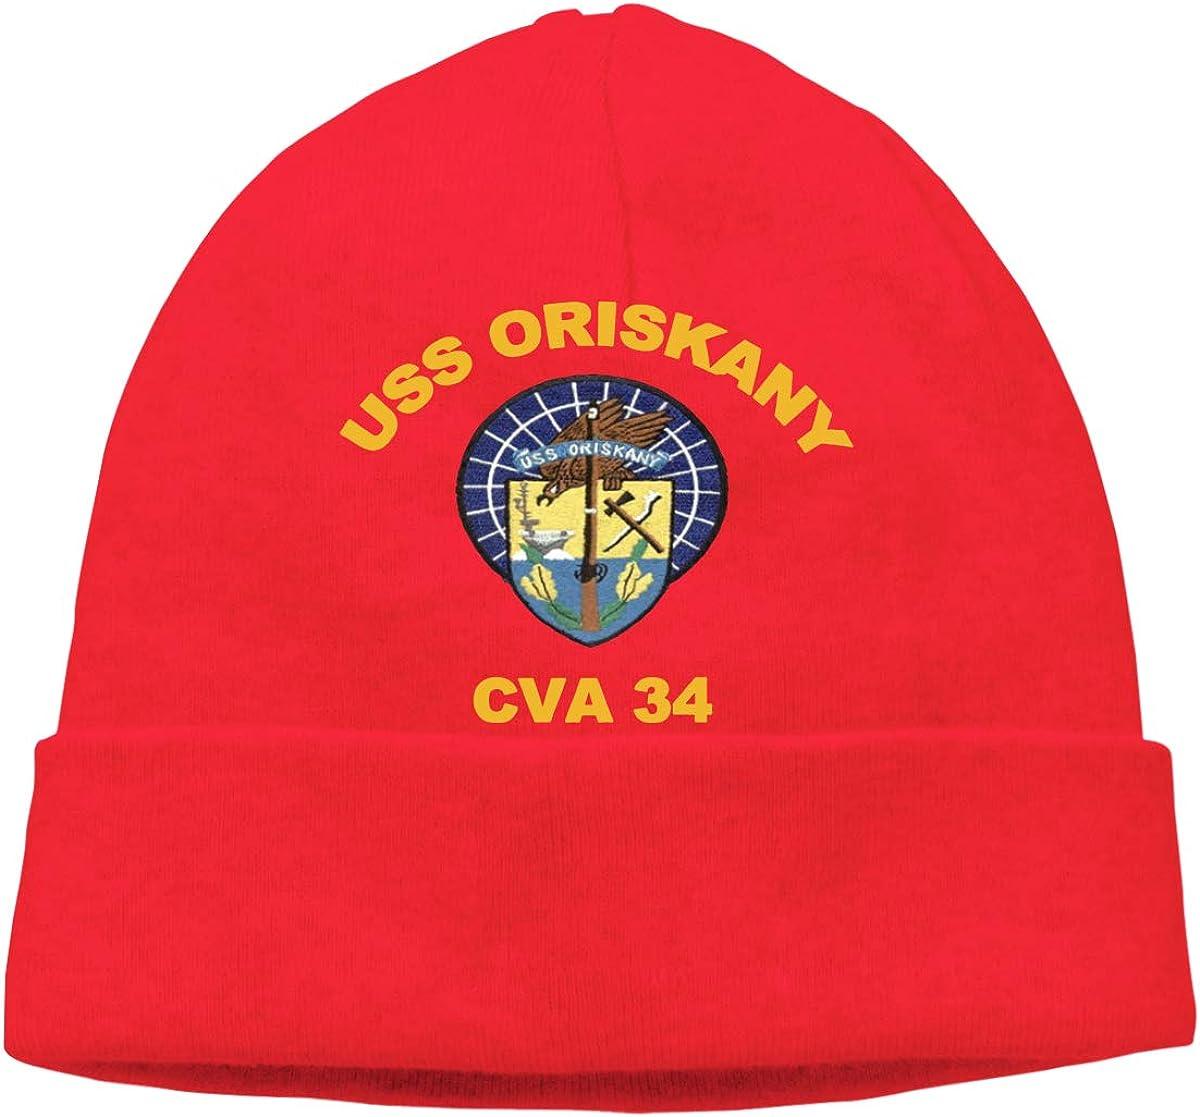 Lapptty Cap USS Ranger CV-61 Men Women Beanie Hat Knitted Beanie Knit Beanie